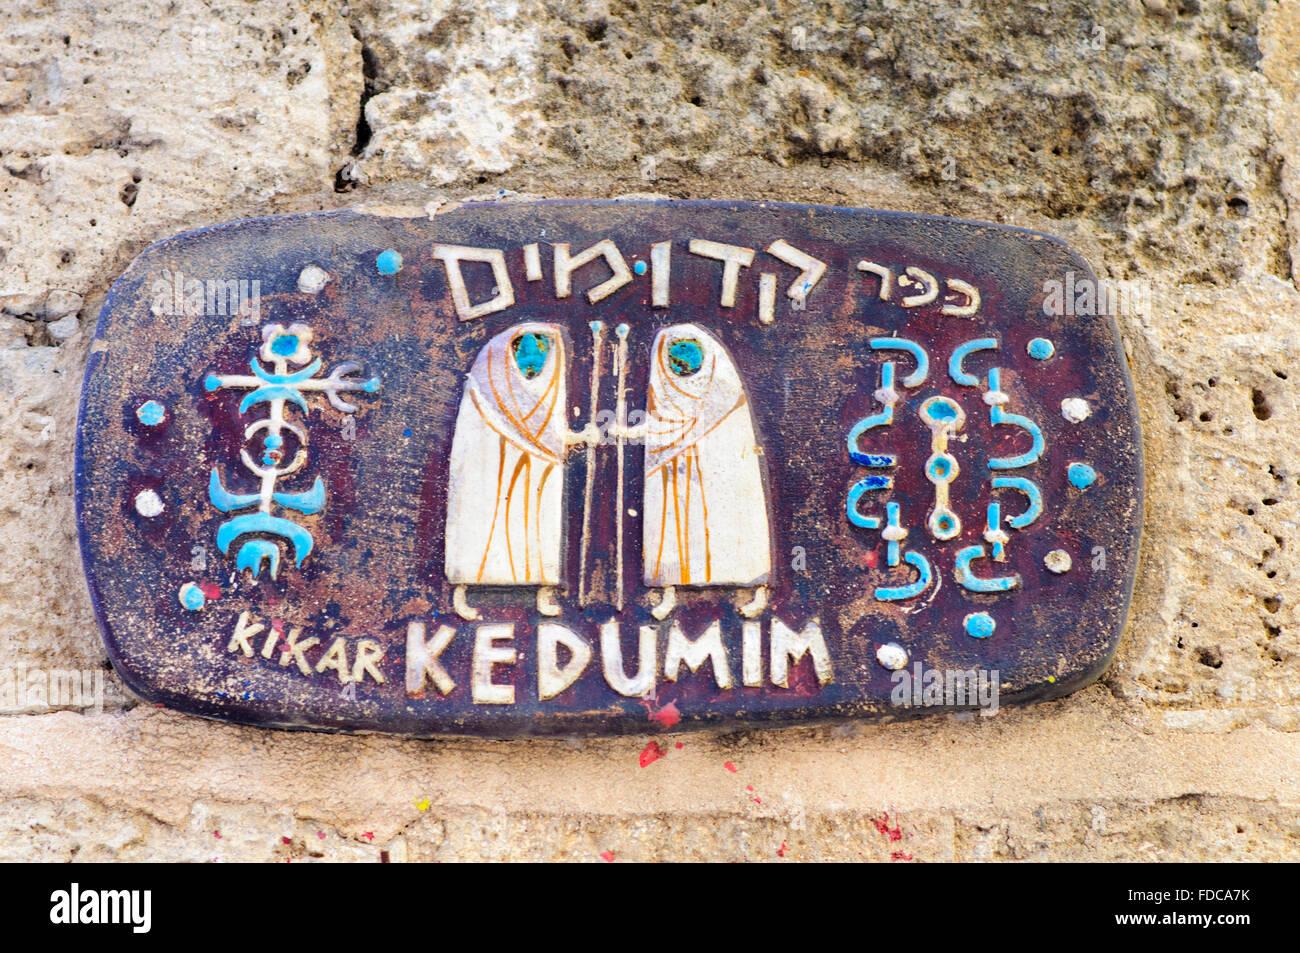 Israel, Jaffa, Ceramic street sign Kikar Kedumim - Stock Image